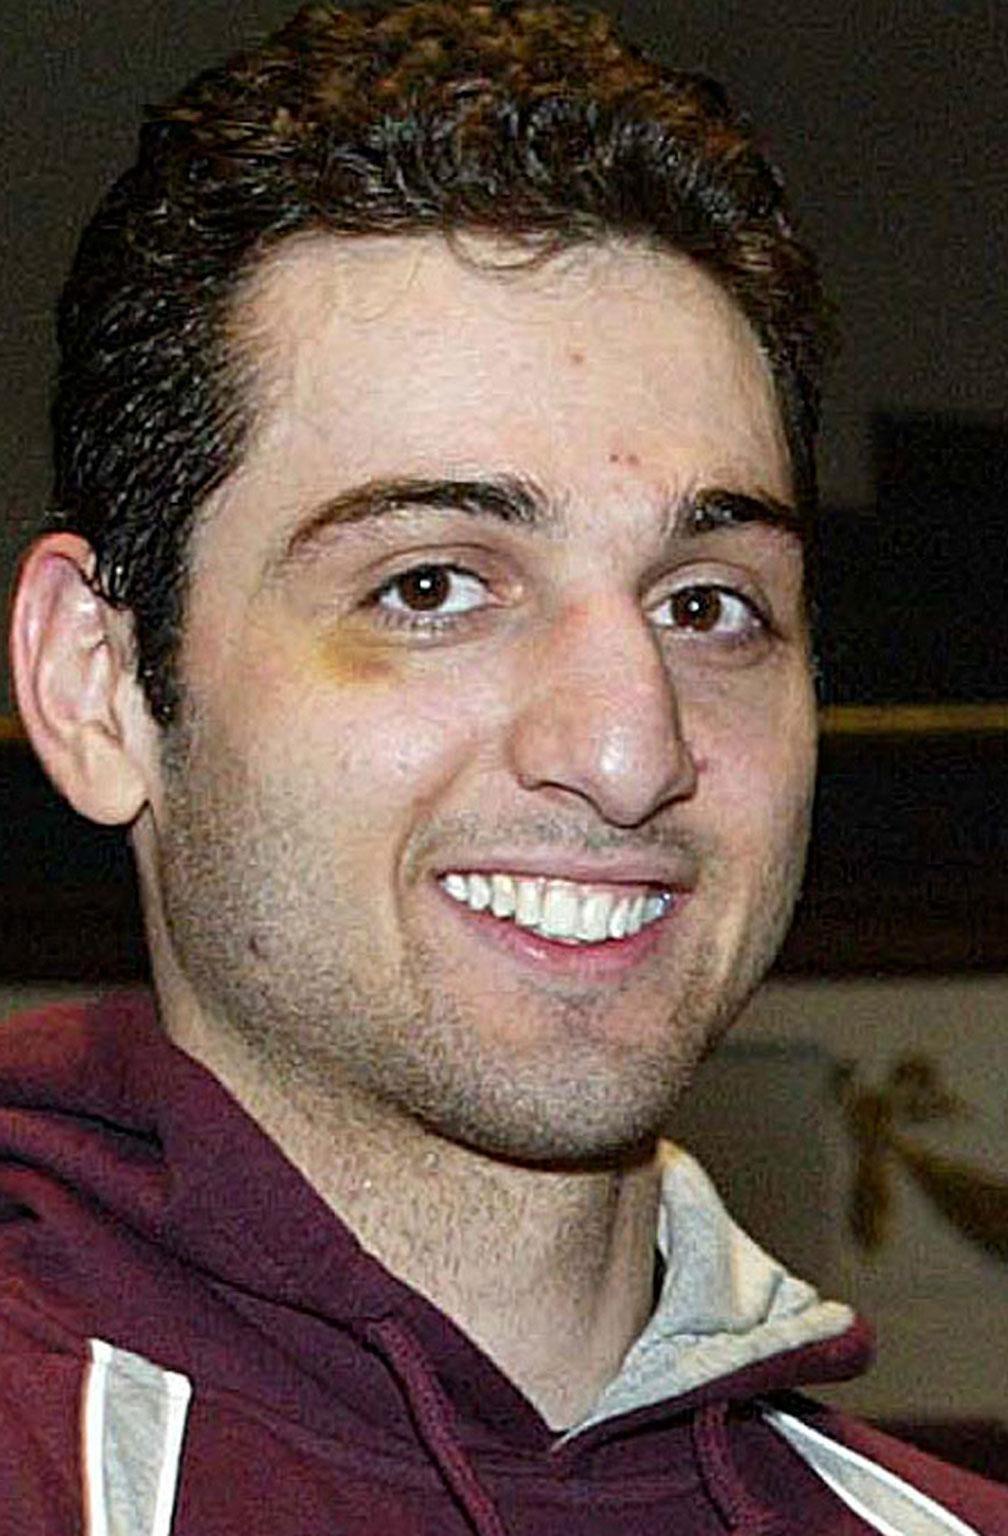 Tamerlan Tsarnaev a suspect in the Boston Marathon bombing